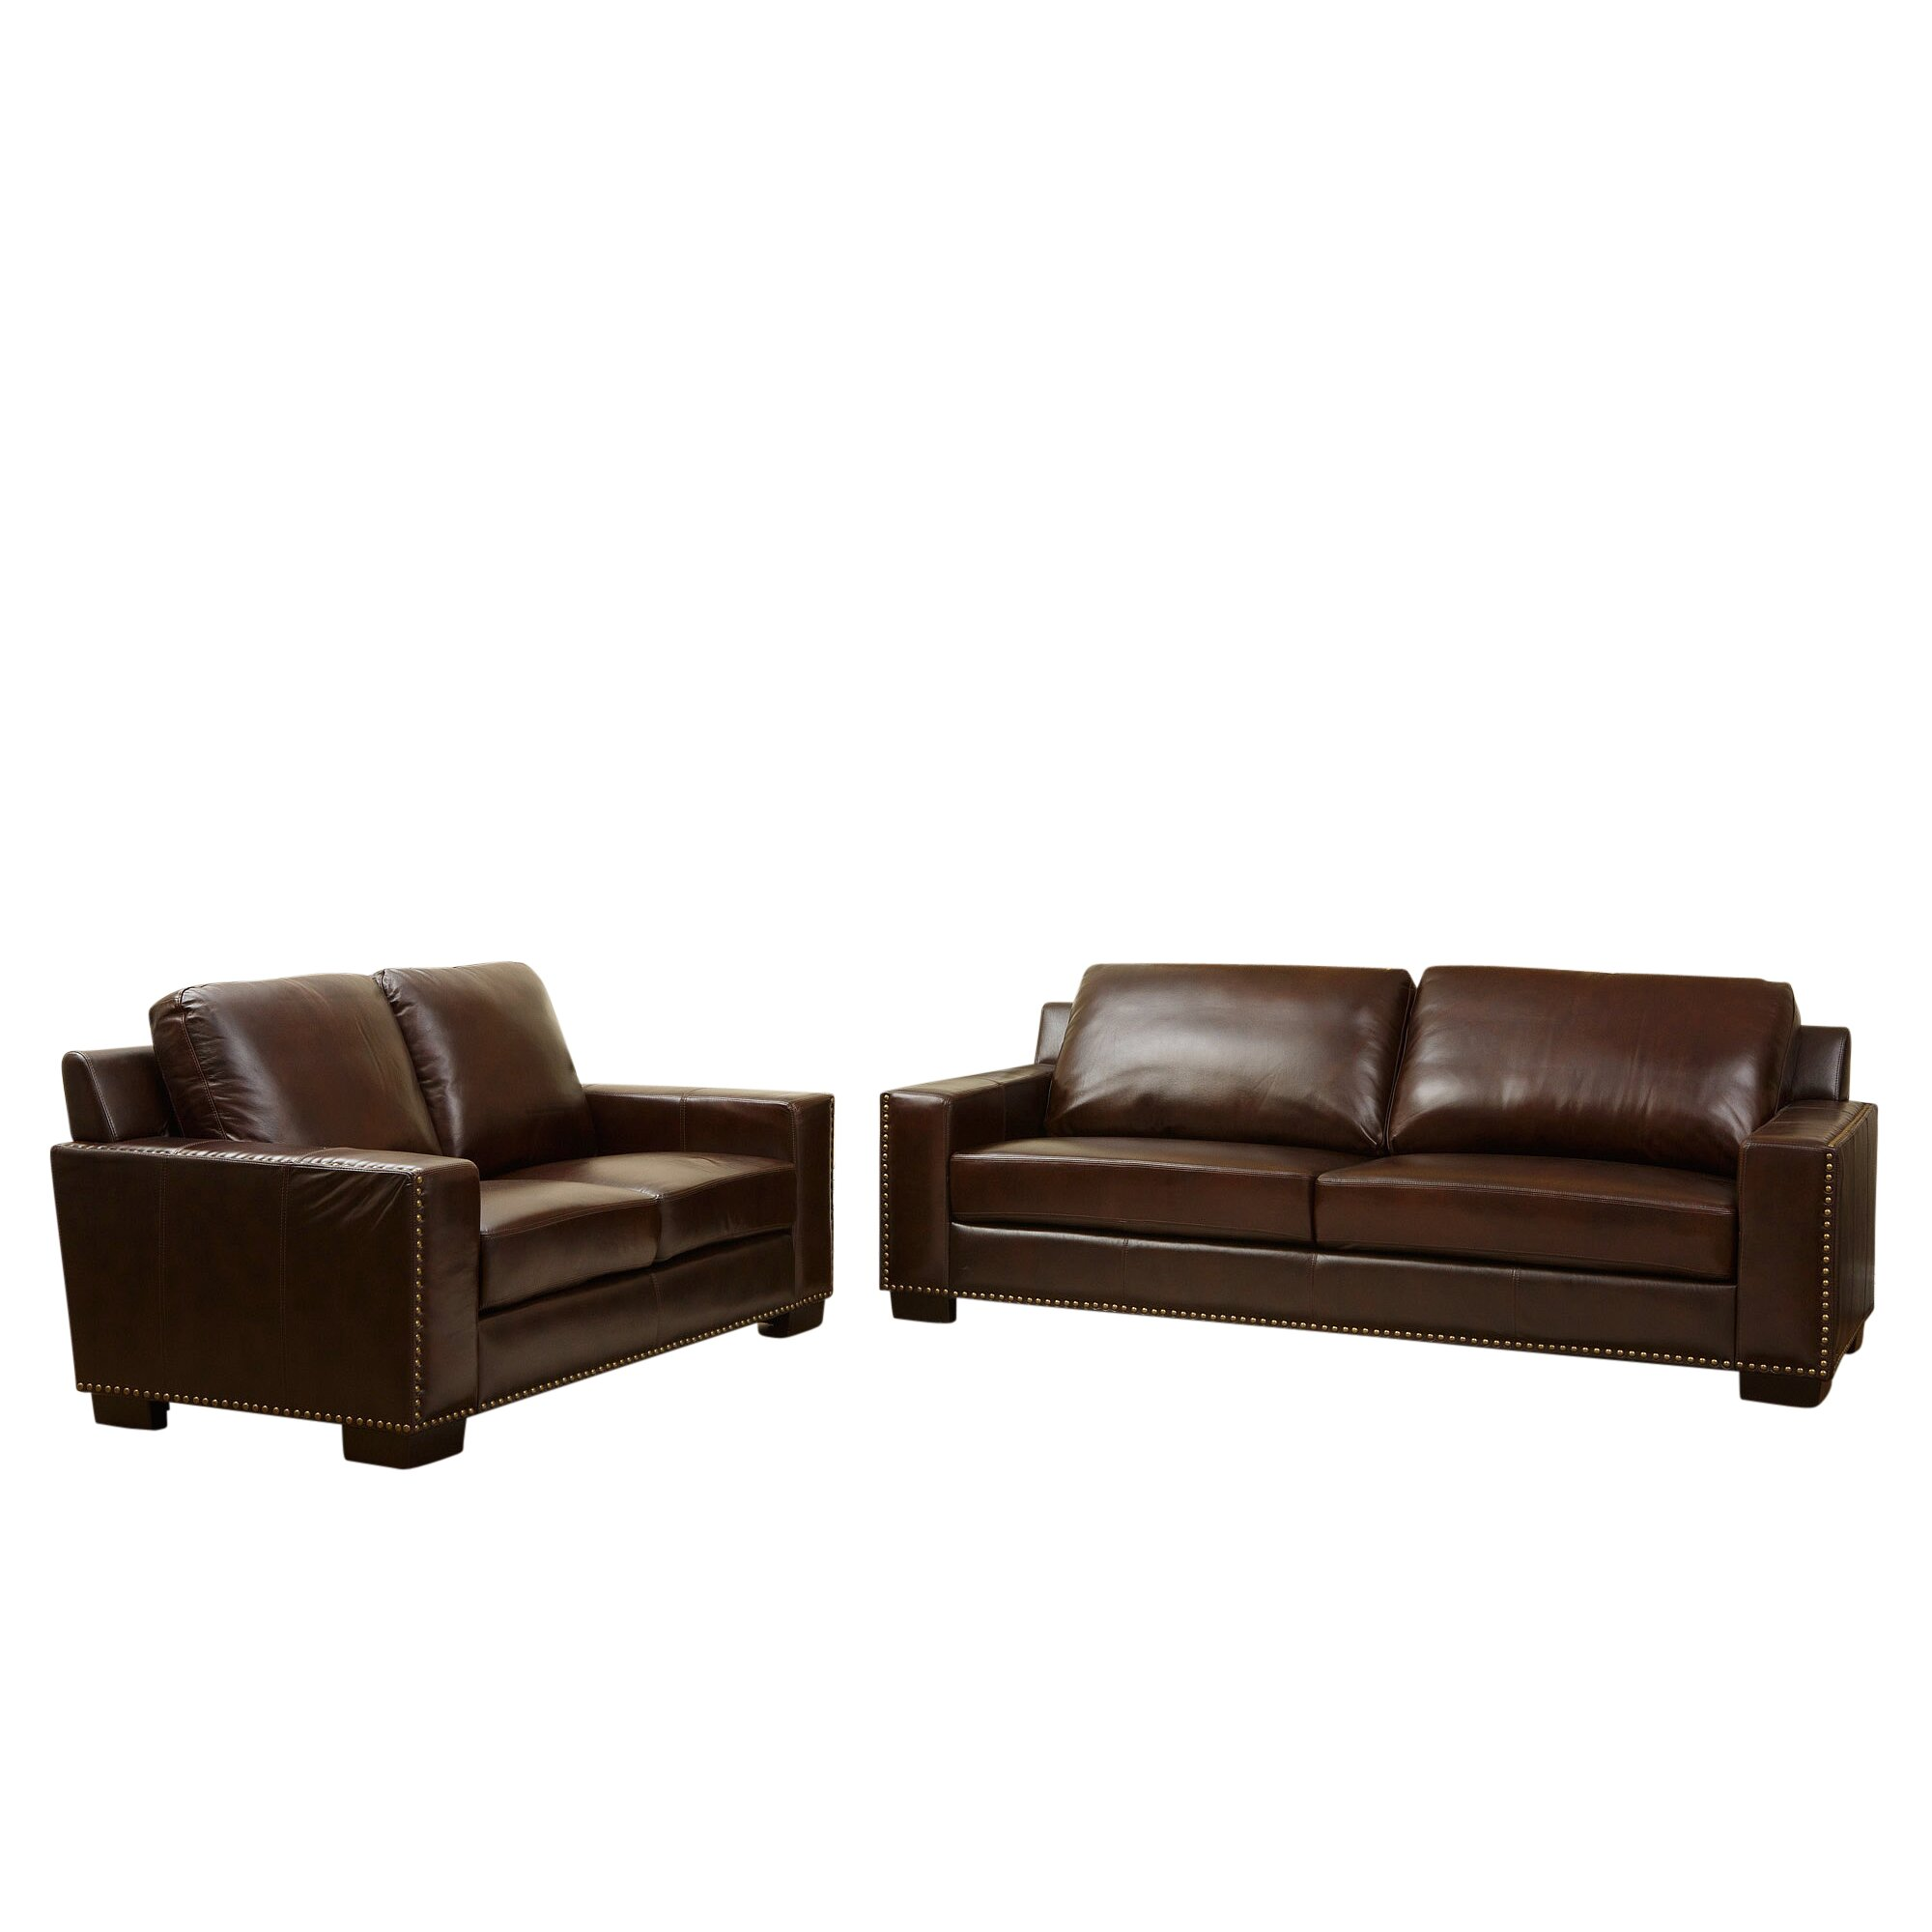 Leather Sofa And Loveseat Set Poundex Tesse F7598 Black Leather Sofa And Loveseat Set A Sofa